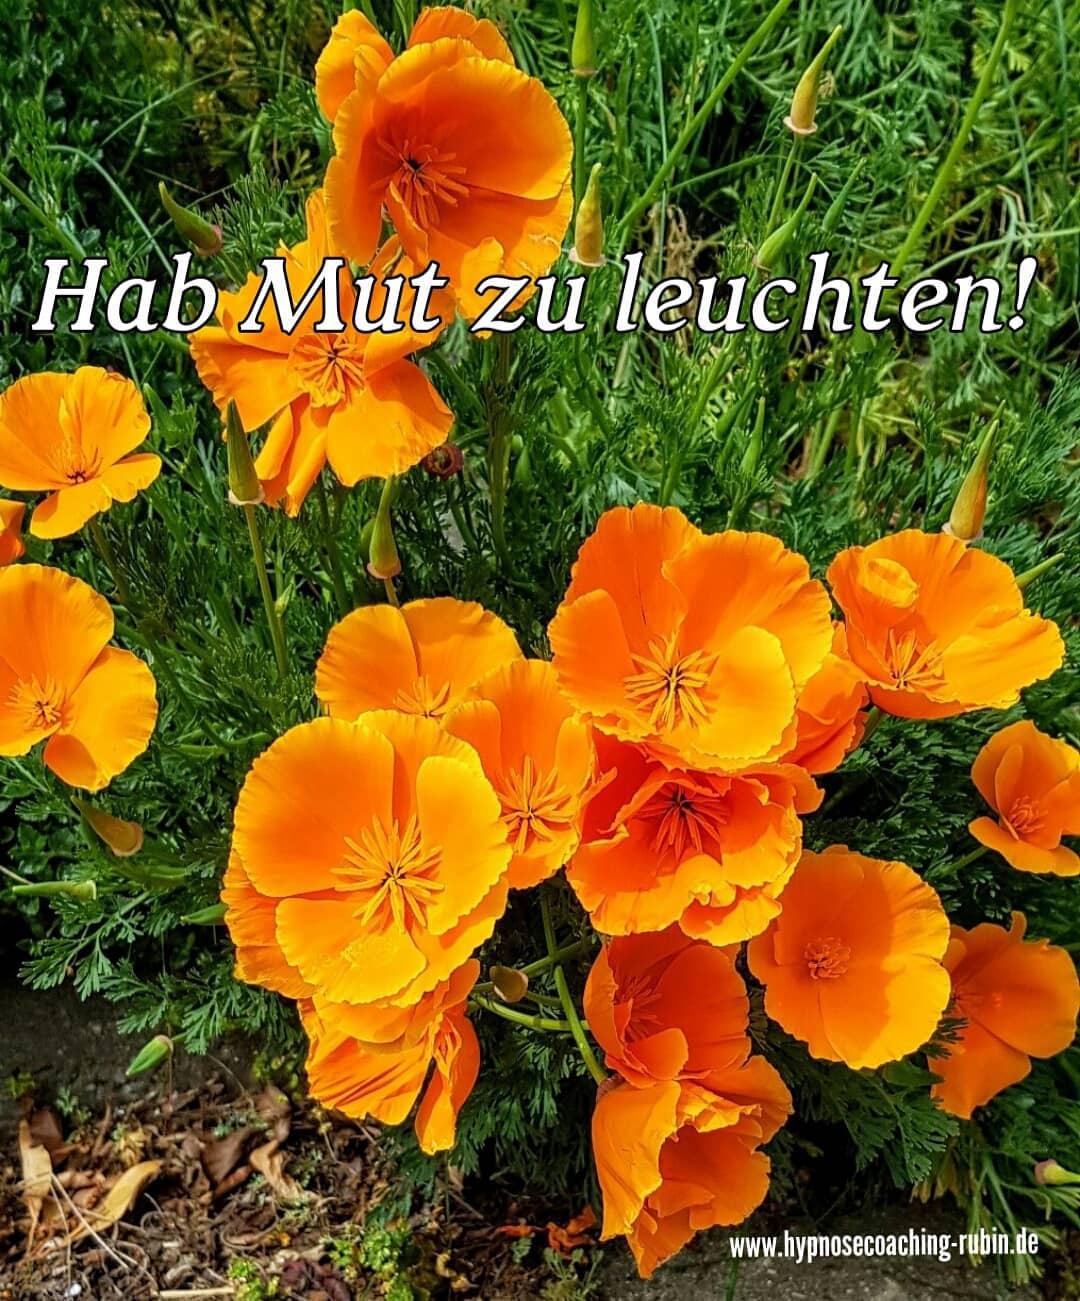 Hab Mut zu leuchten | Blog | Hypnose Coaching Aachen